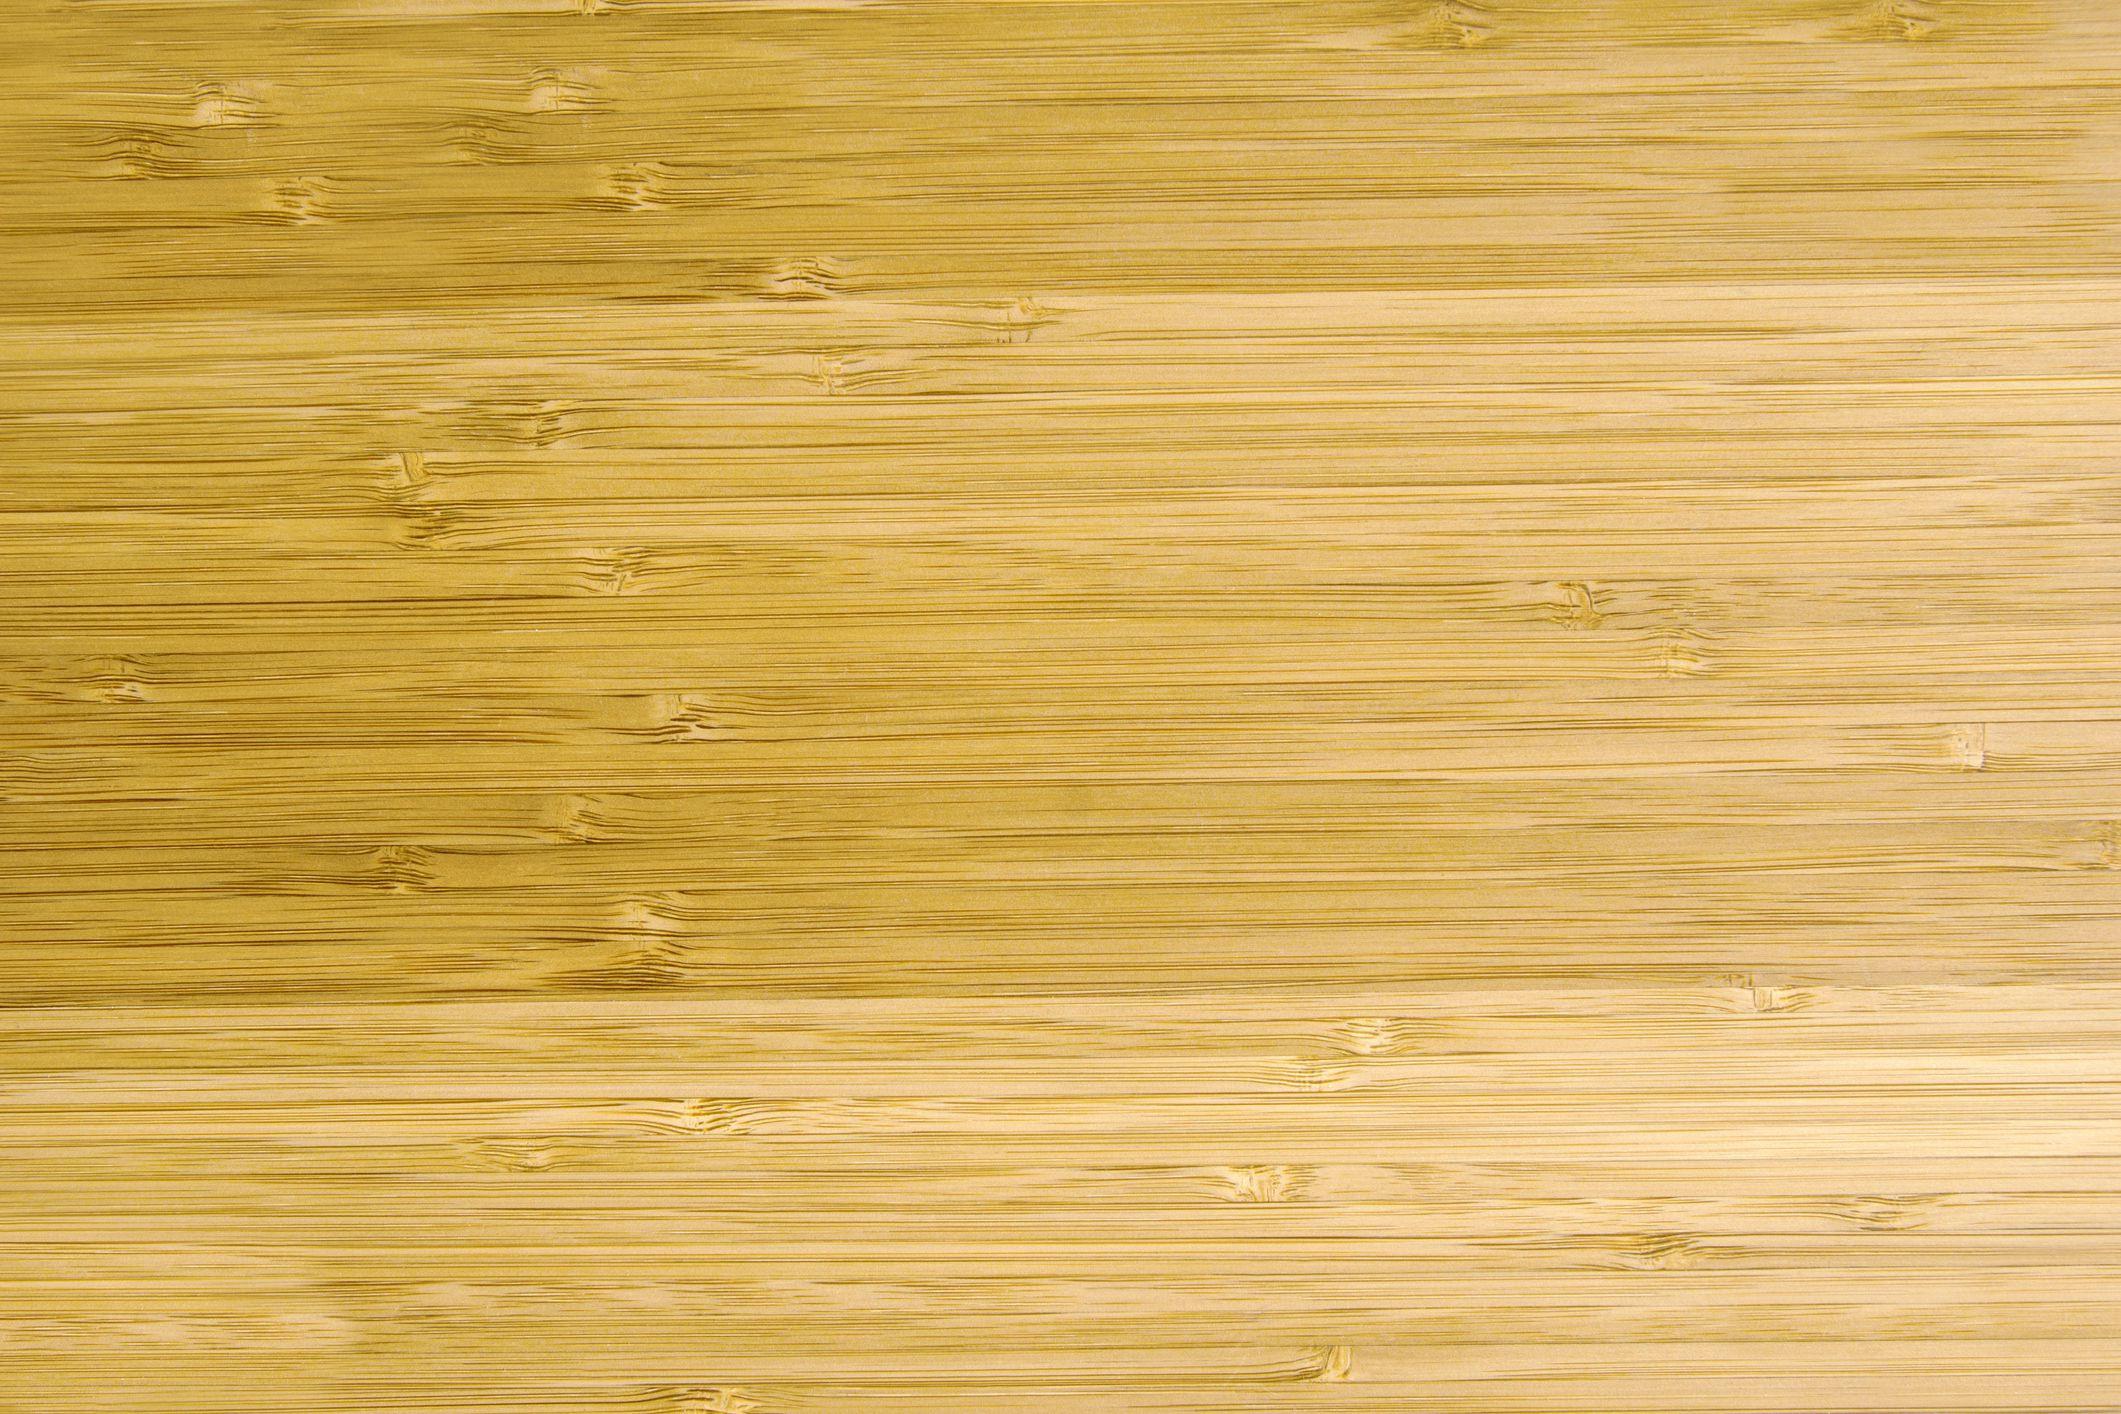 16 Fabulous Bamboo Hardwood Flooring Durability 2021 free download bamboo hardwood flooring durability of 5 best bamboo floors with bamboo board 175428713 581a20835f9b581c0b953203